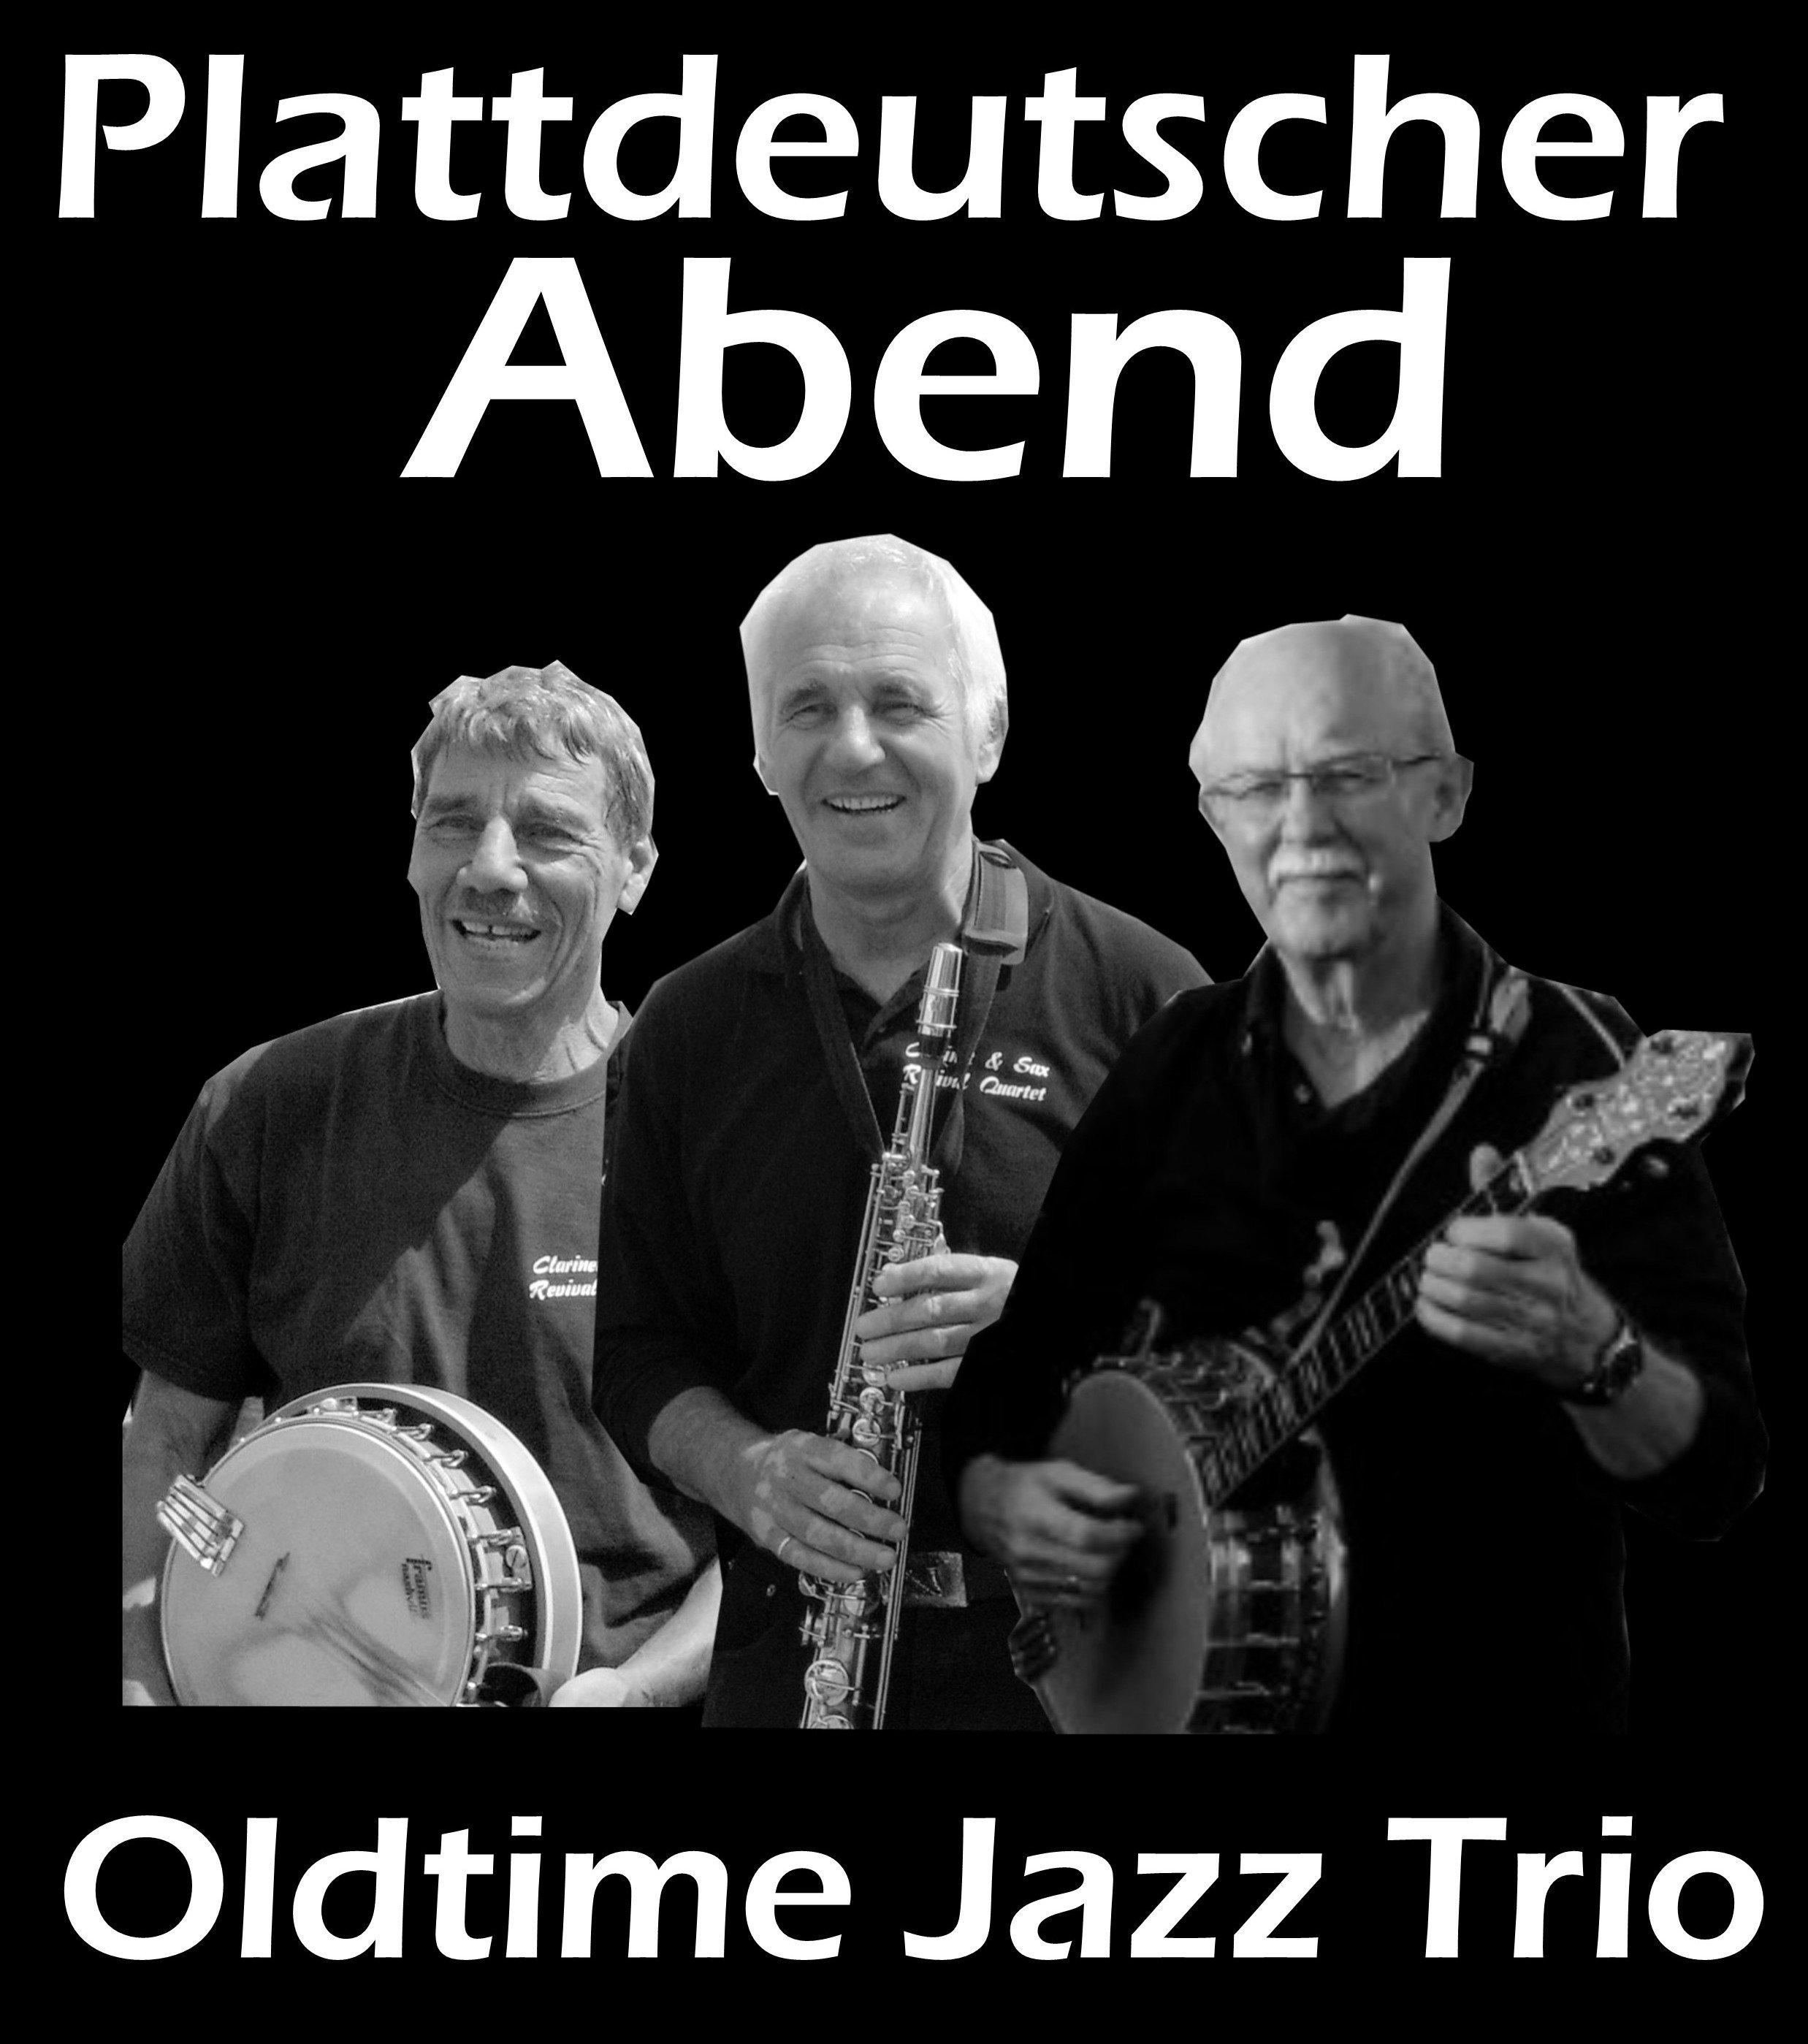 Oldtime Jazz Trio